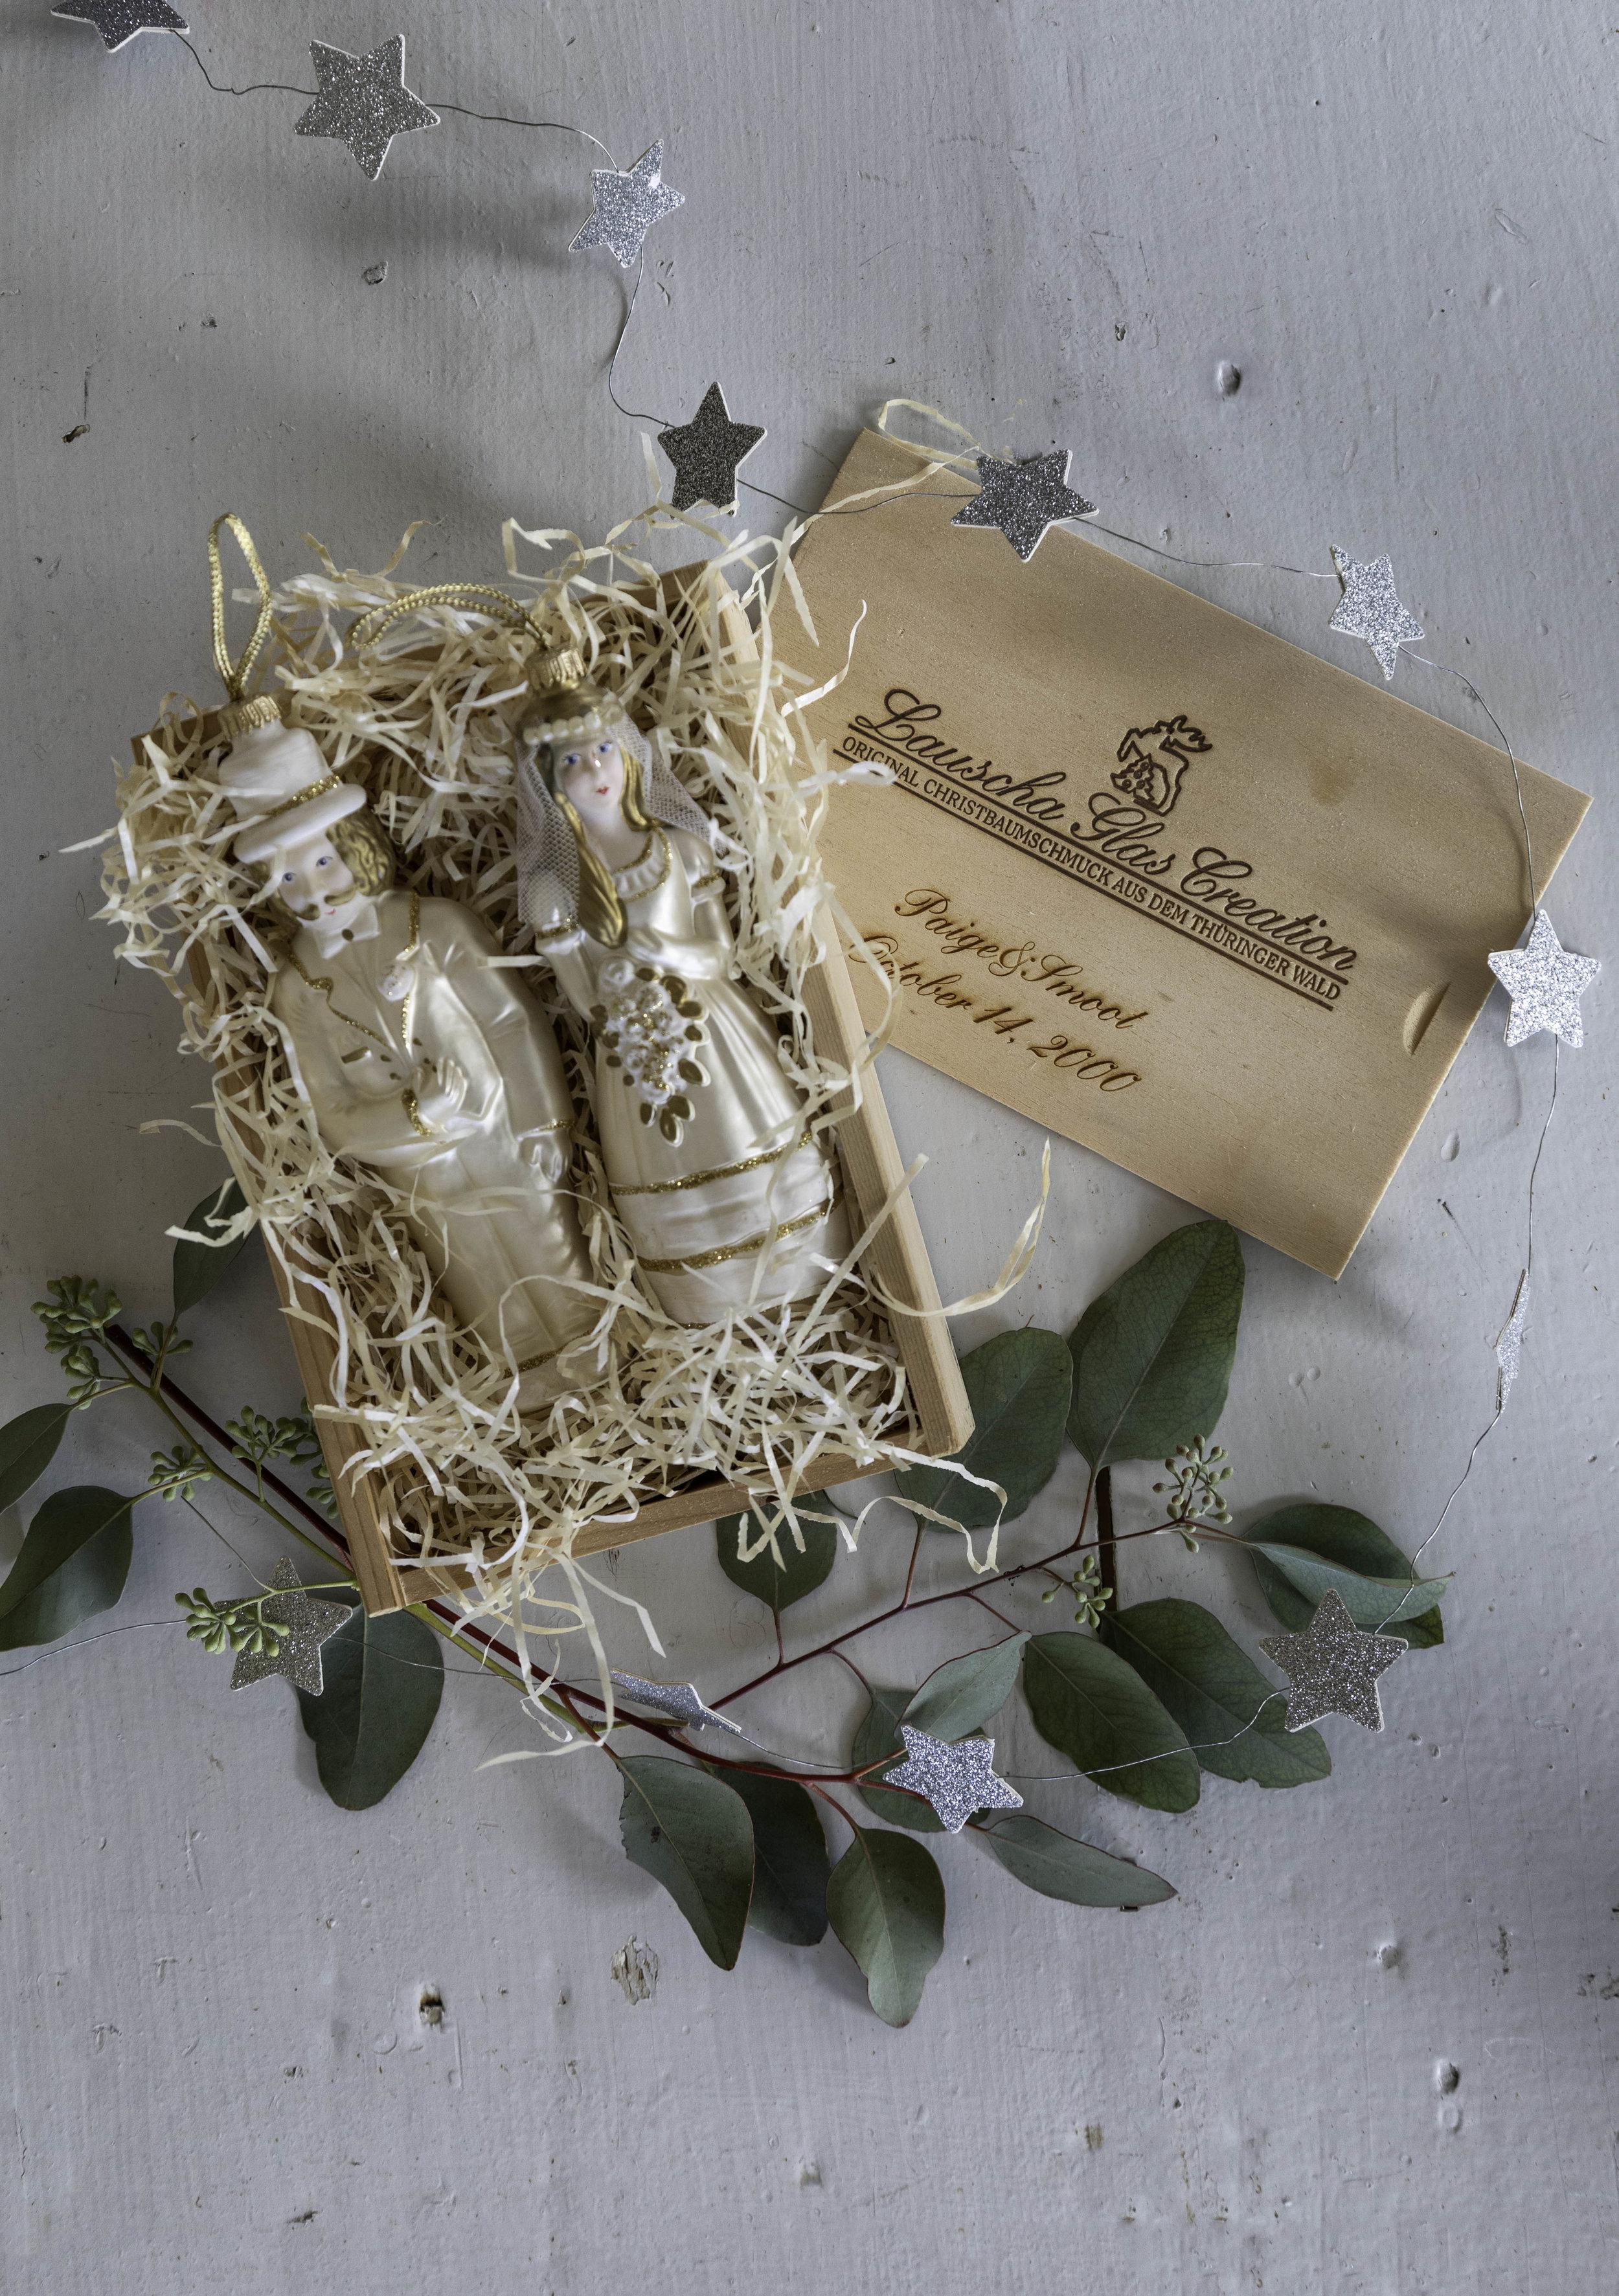 RVT Swedish Christmas. Paige's Blog. Family Heirlooms. Natural holiday decor. Christmas. Ornaments. Wedding ornaments. Swedish heirlooms